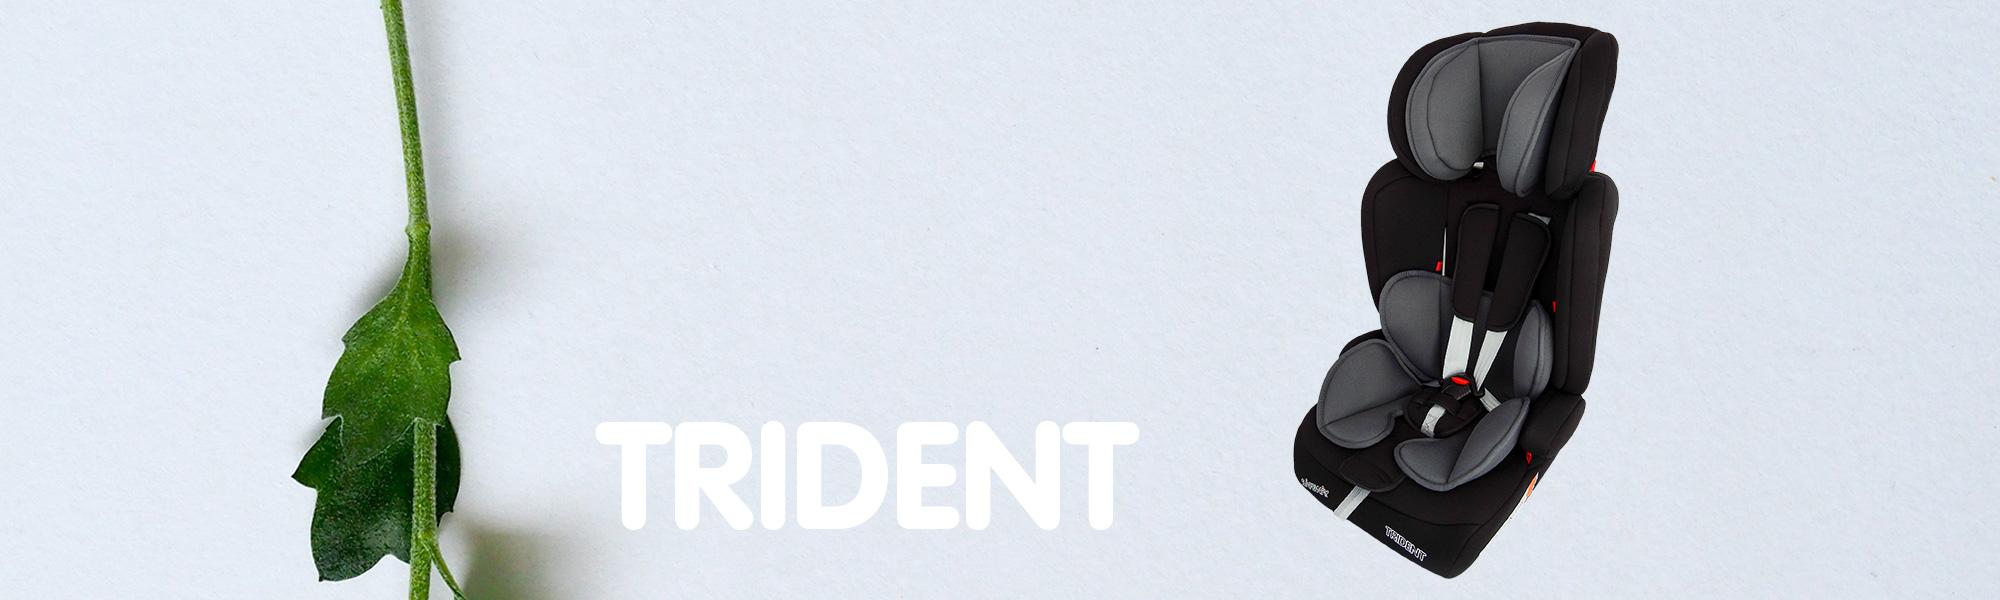 Trident-2000x600